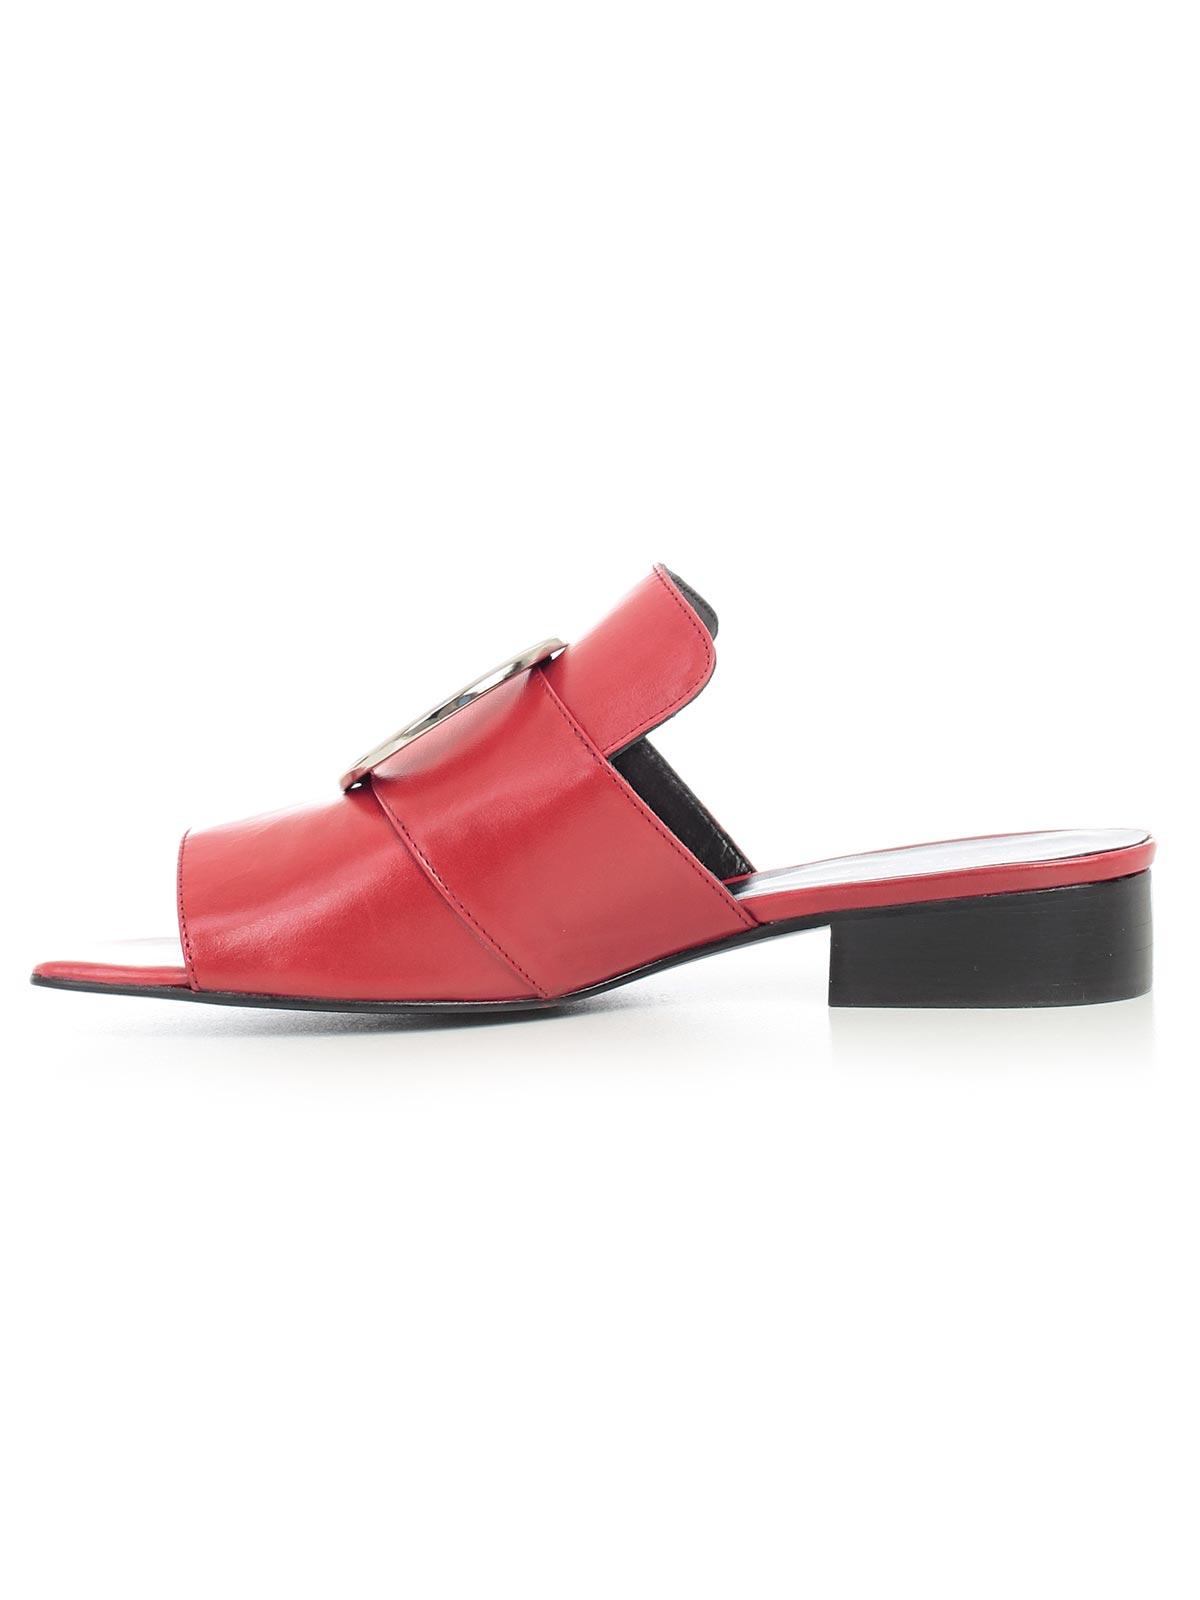 Picture of Dorateymur Footwear